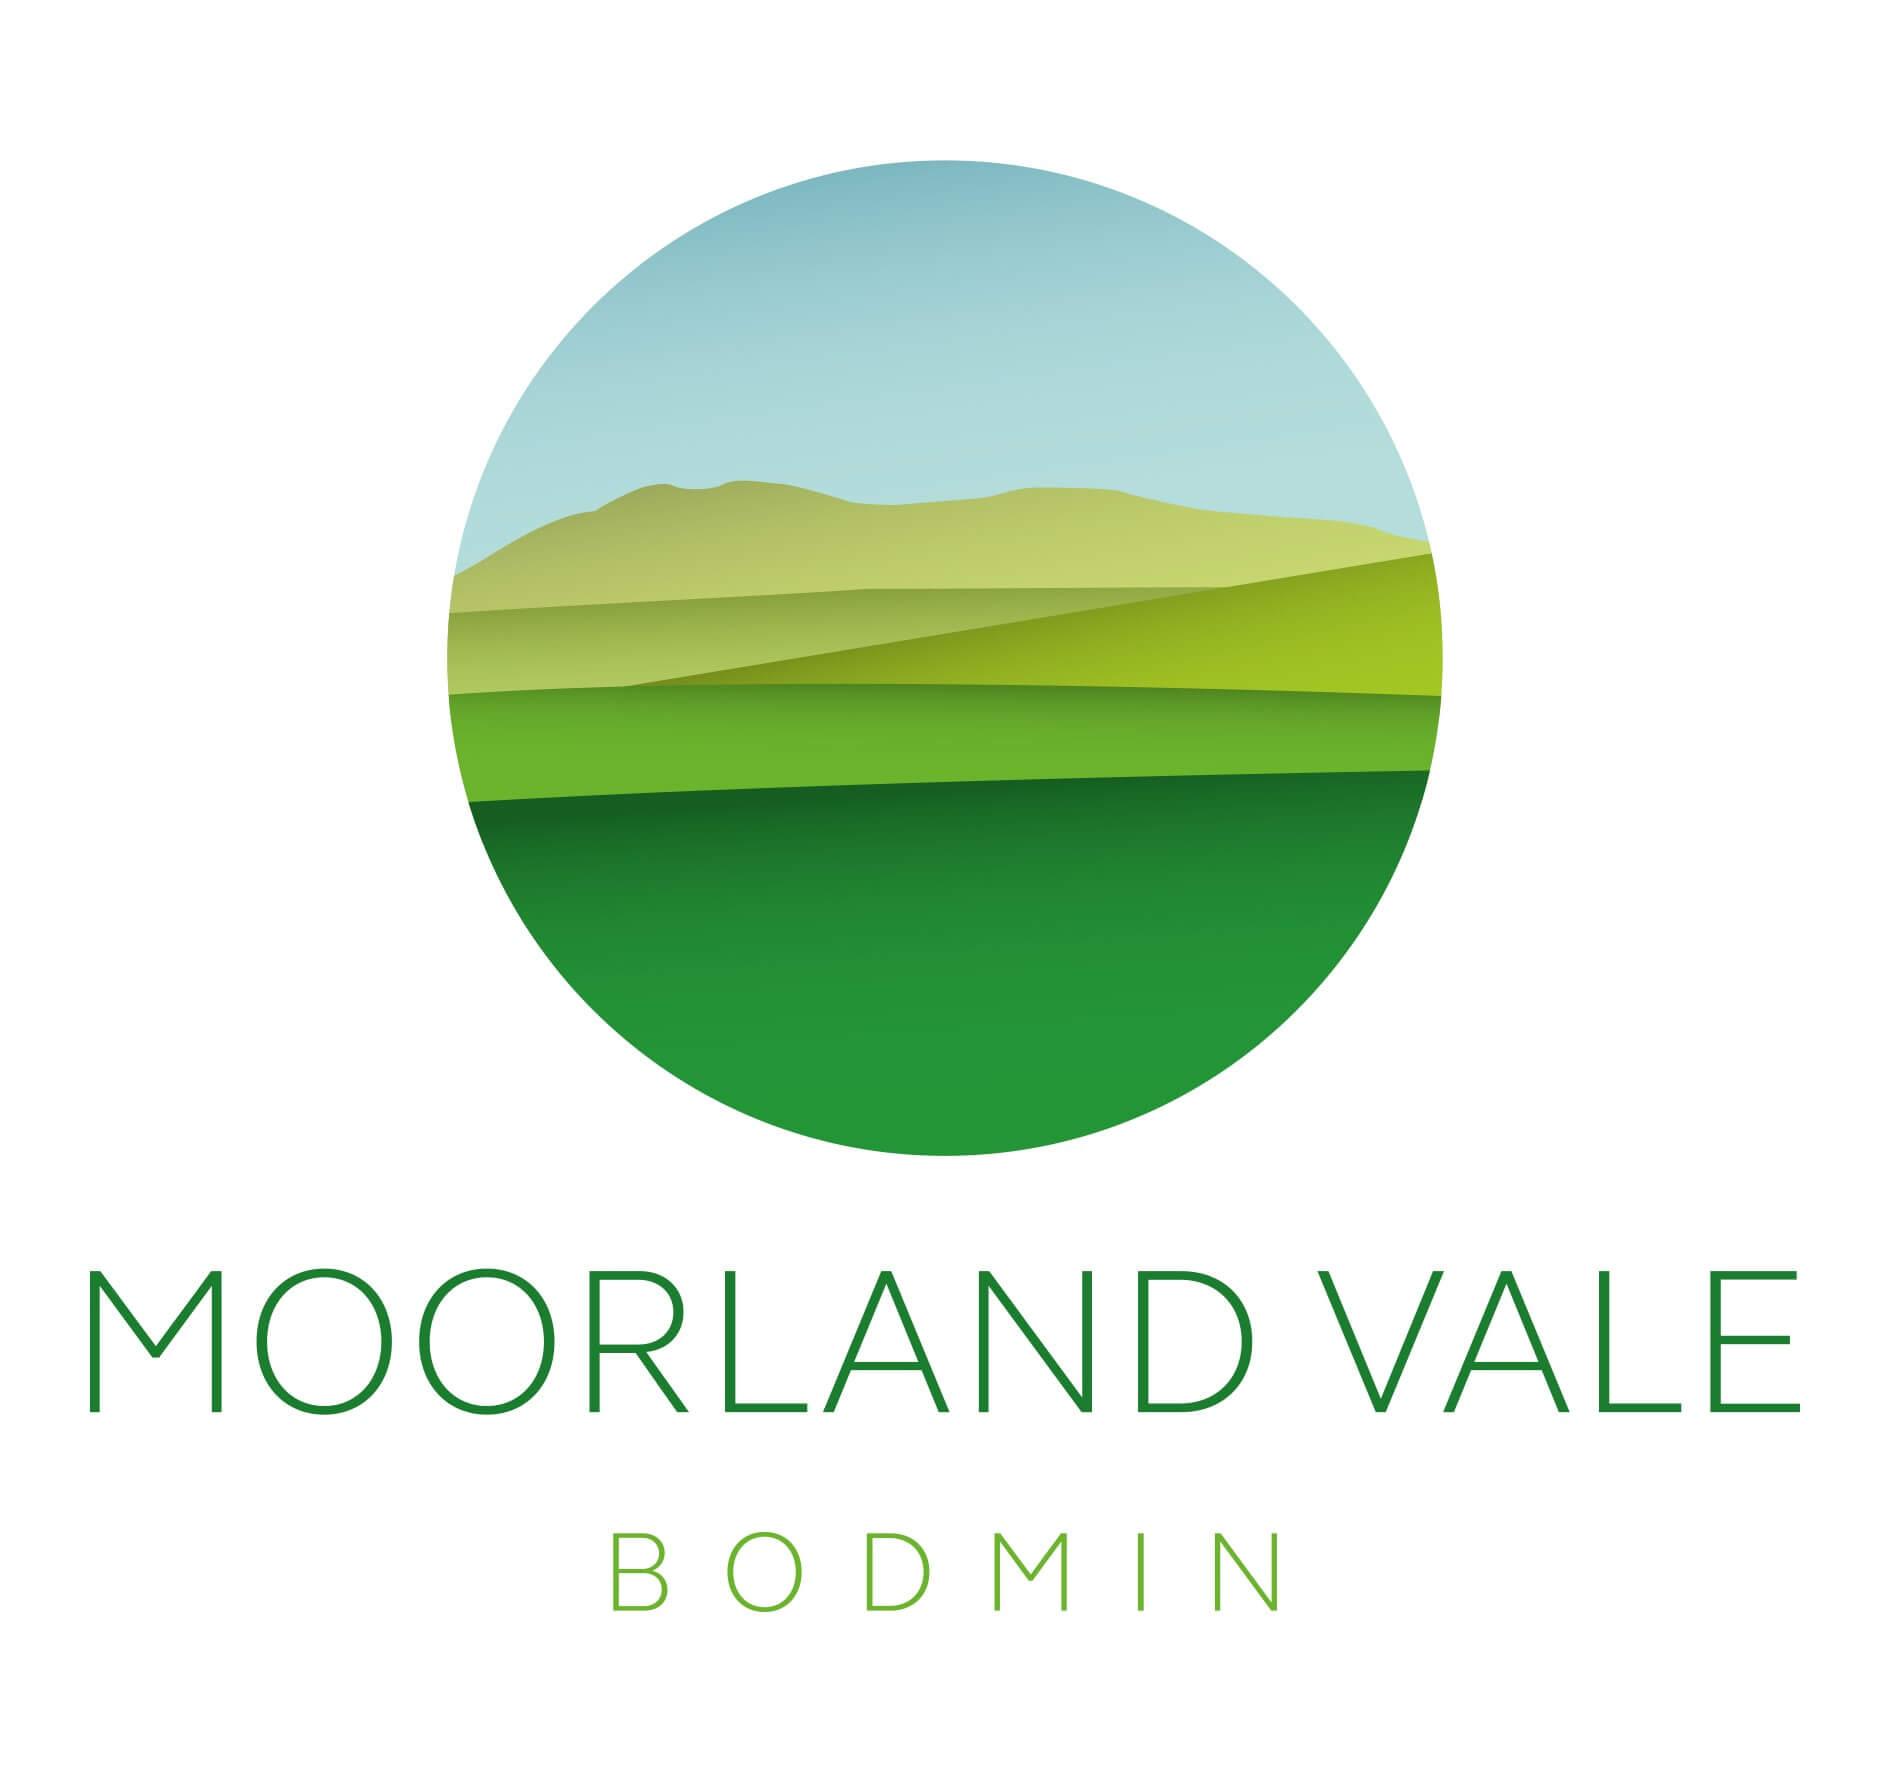 Moorland Vale logo